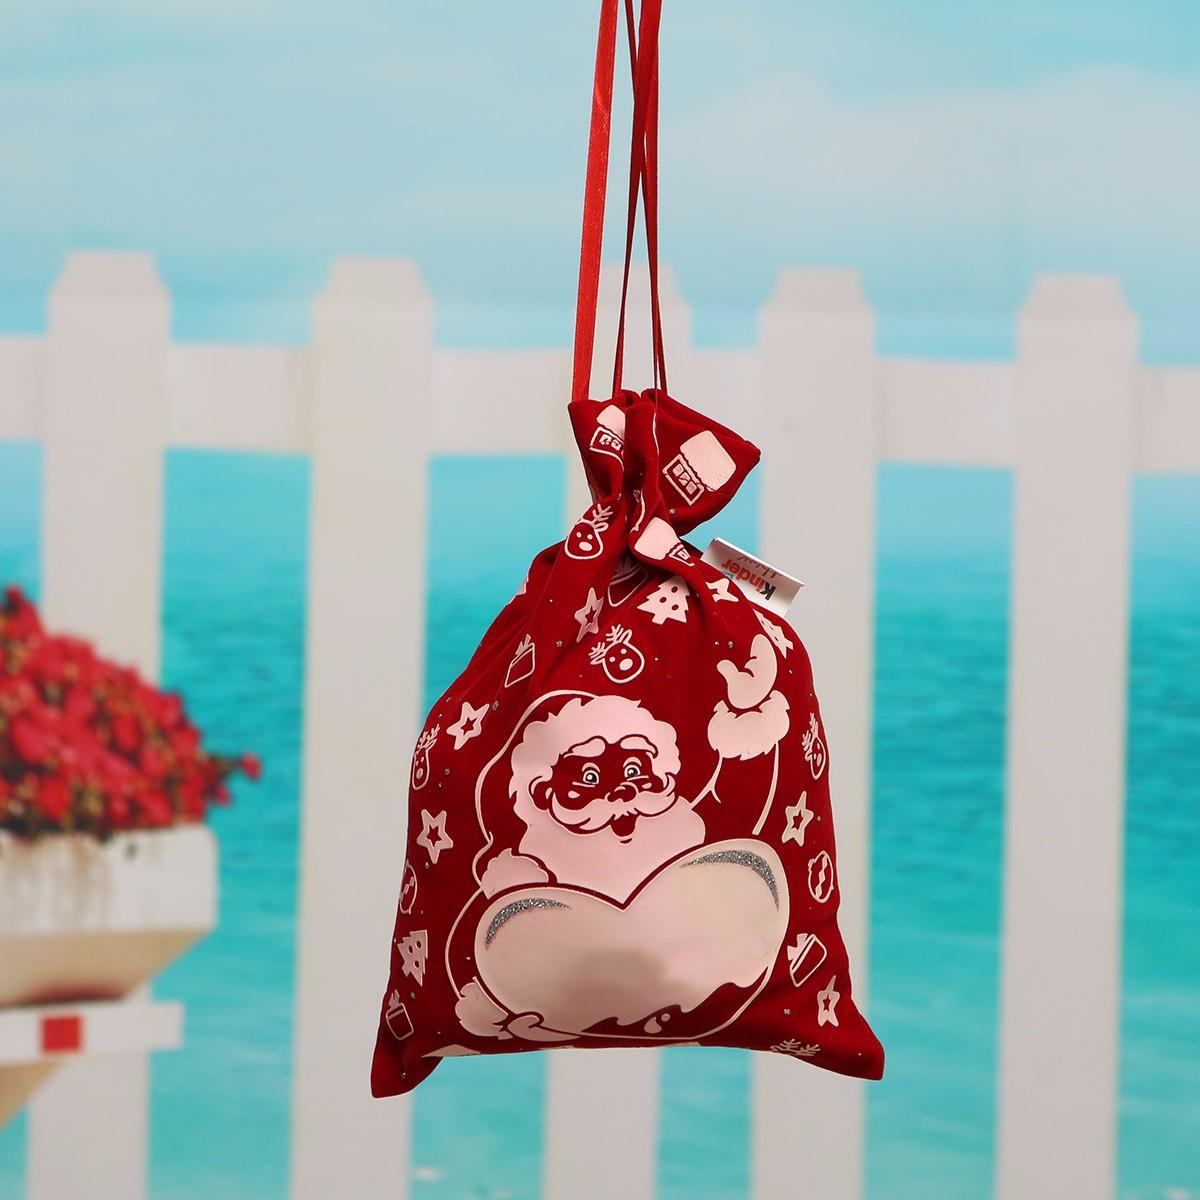 Flocked Christmas Santa Stars Deer Drawstring Gift Bag Candy Chocolate Bag Xmas Tree Hanging Decorative Crafts Accessories(China (Mainland))